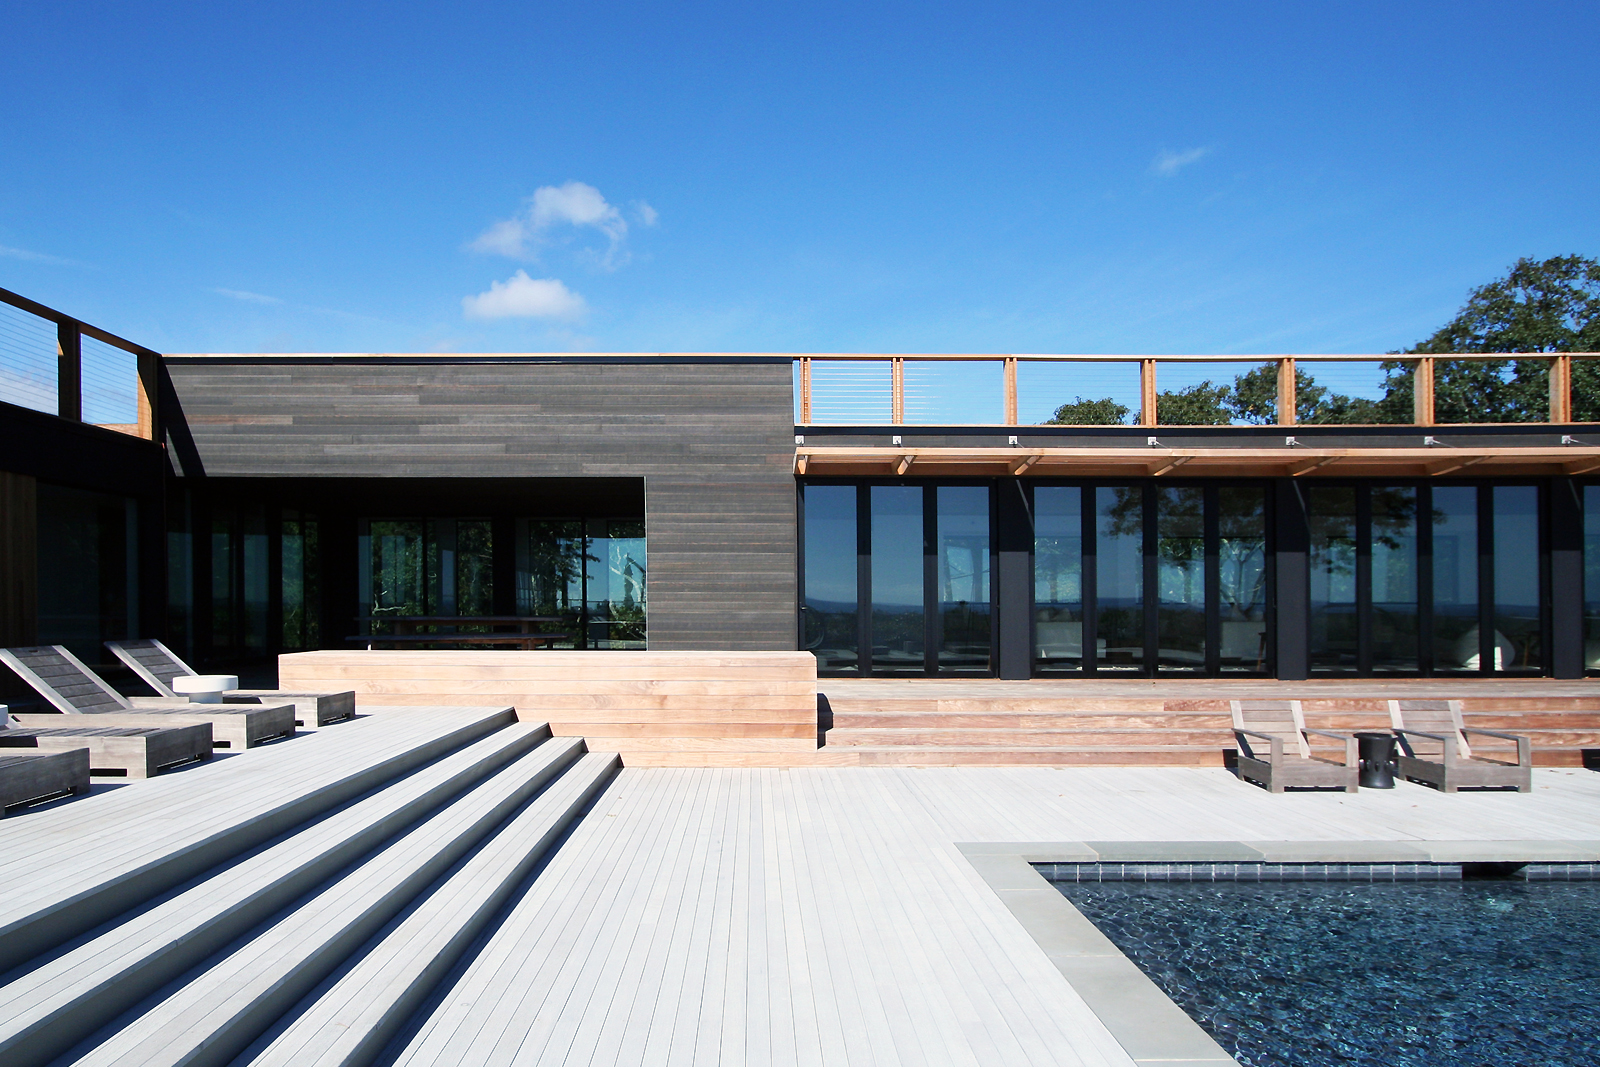 res4-resolution-4-architecture-modern-modular-house-prefab-amagansett-addition-exterior-facade-pool-deck-terrace.jpg